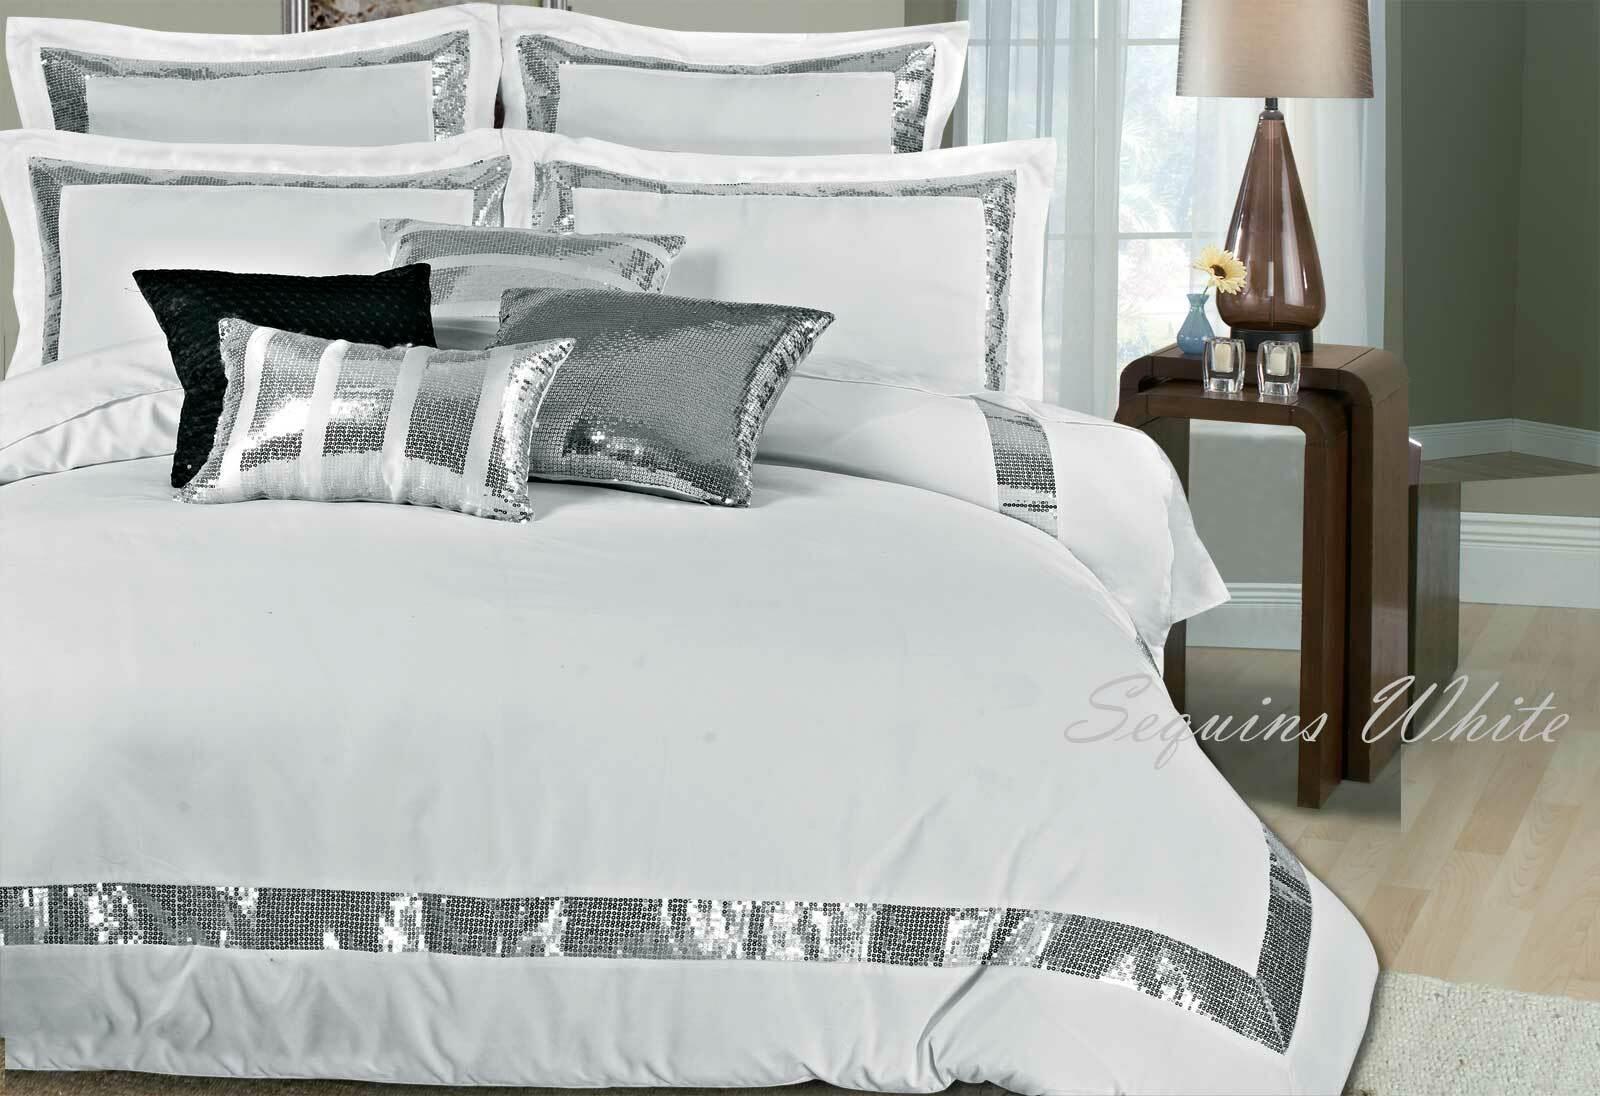 Sequins White Duvet / quilt Cover Set